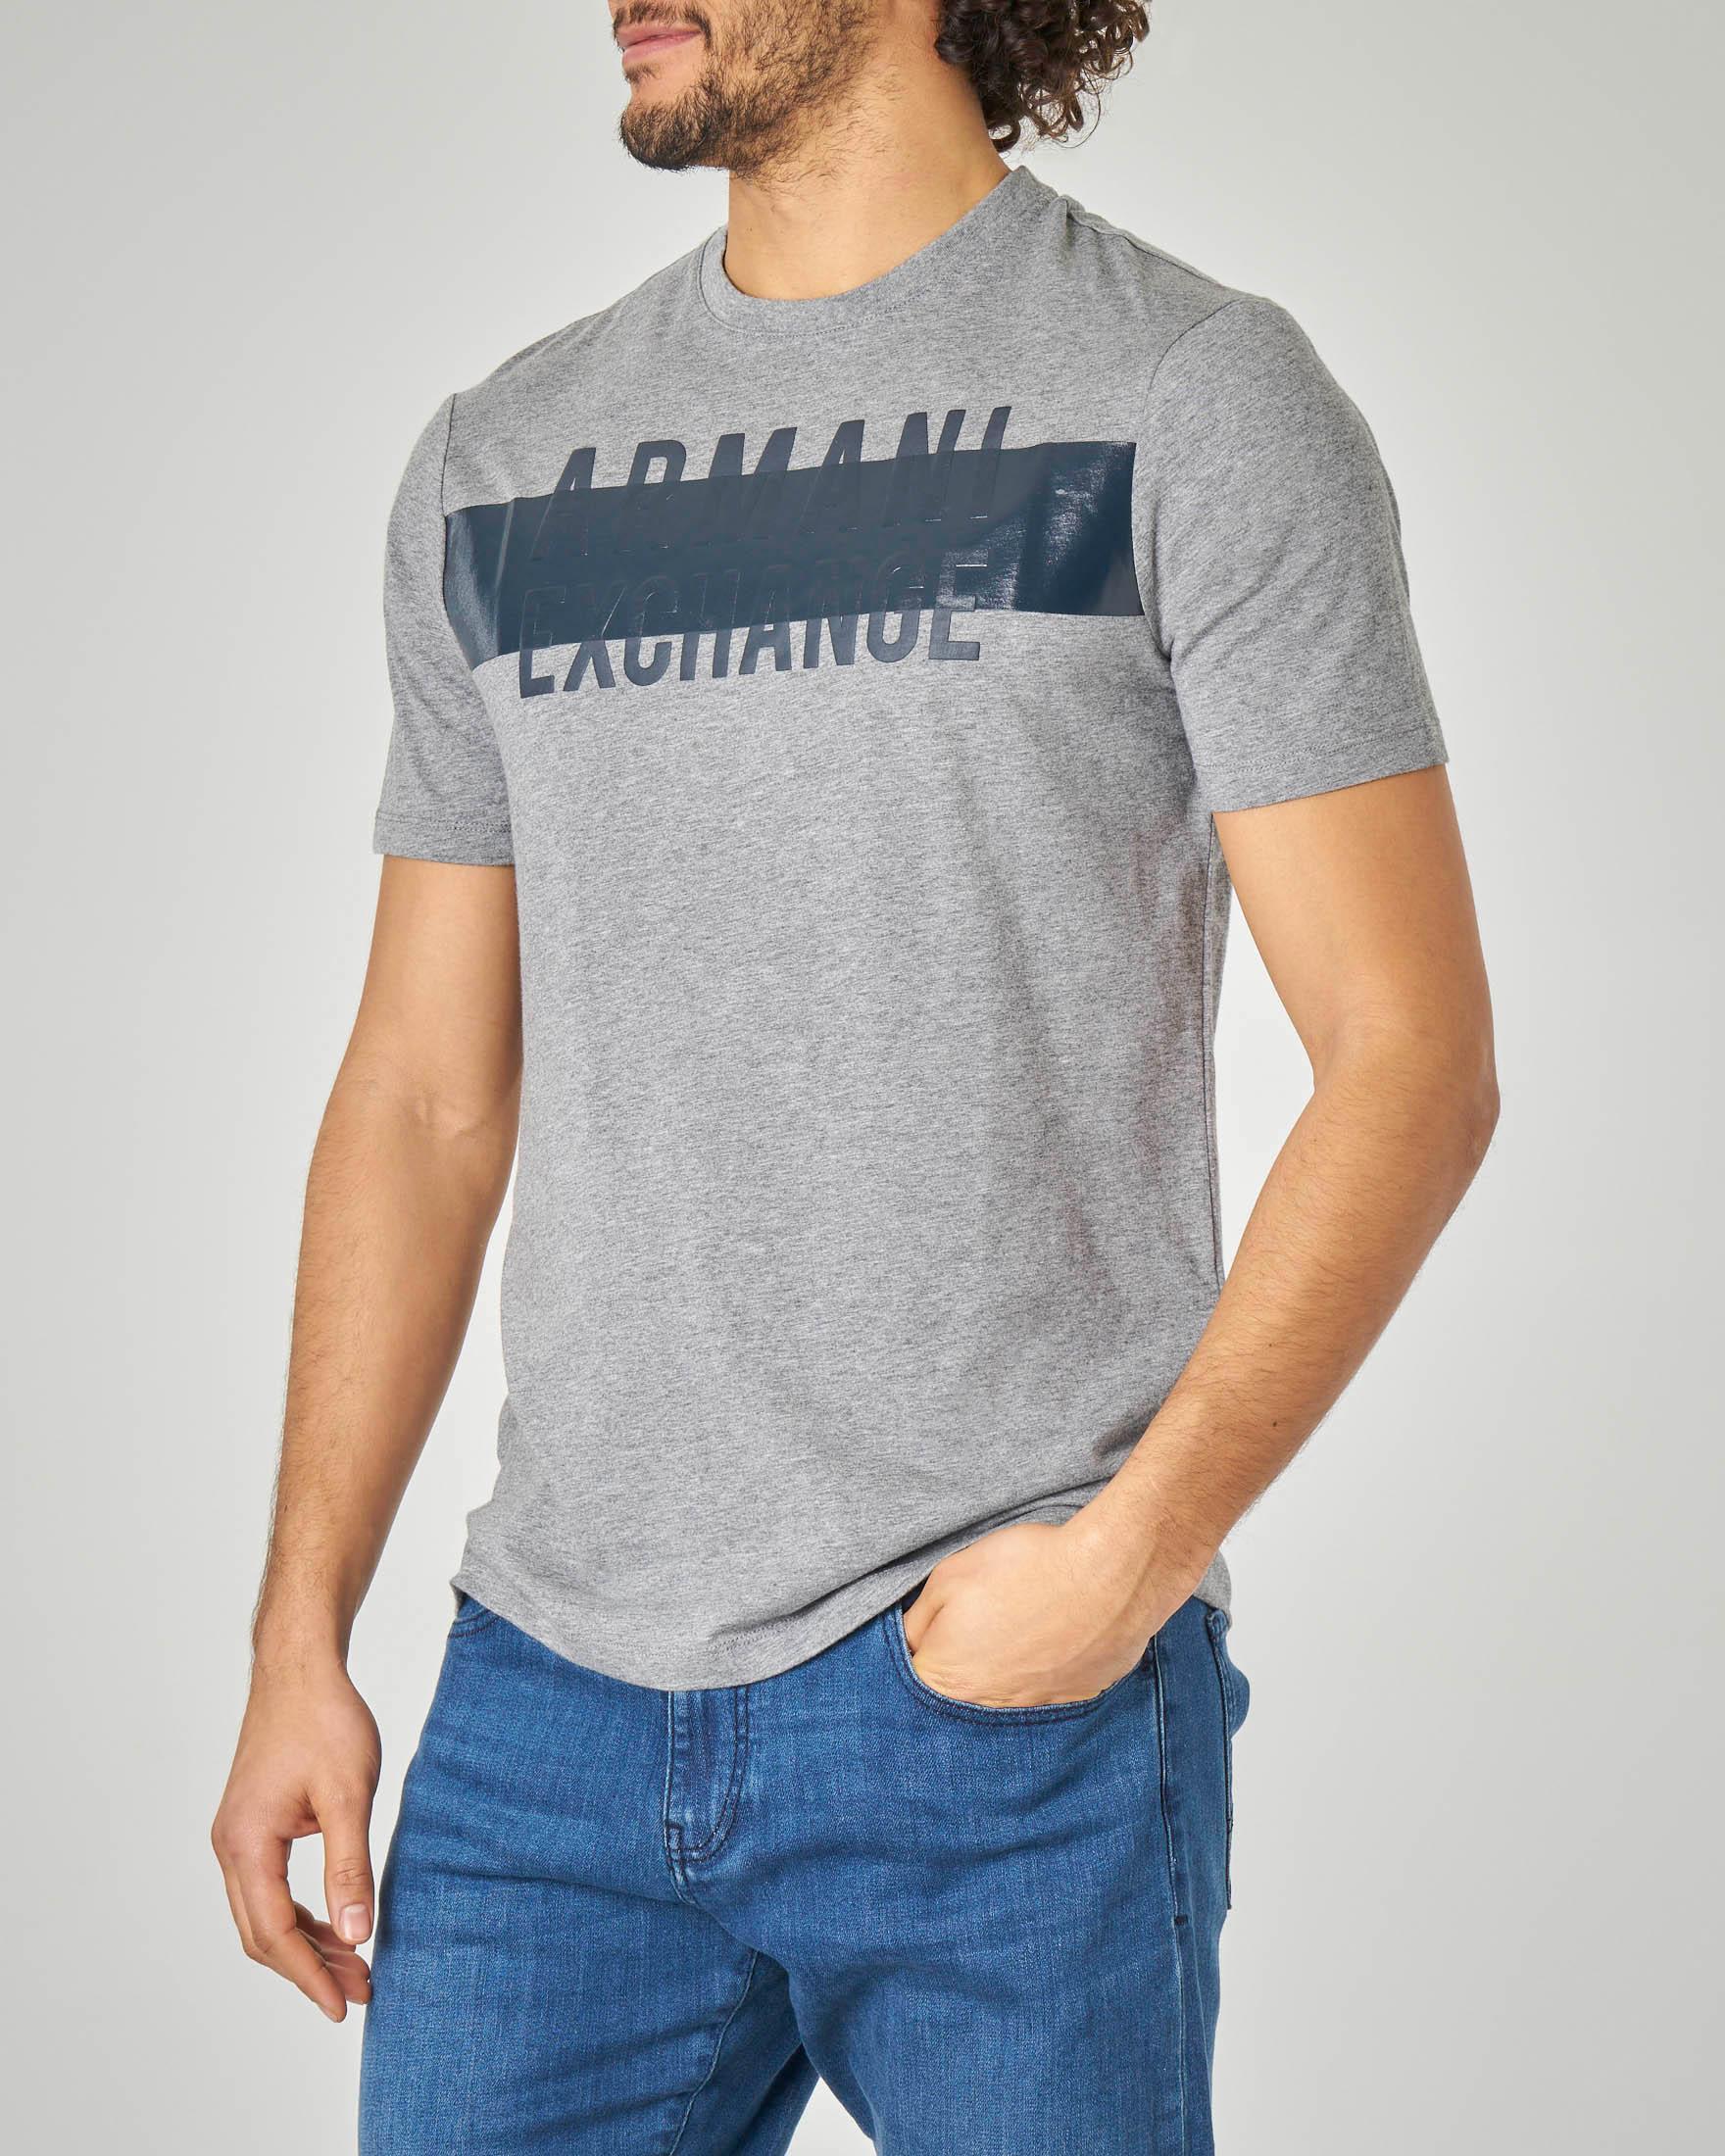 T-shirt grigia con logo e riga blu